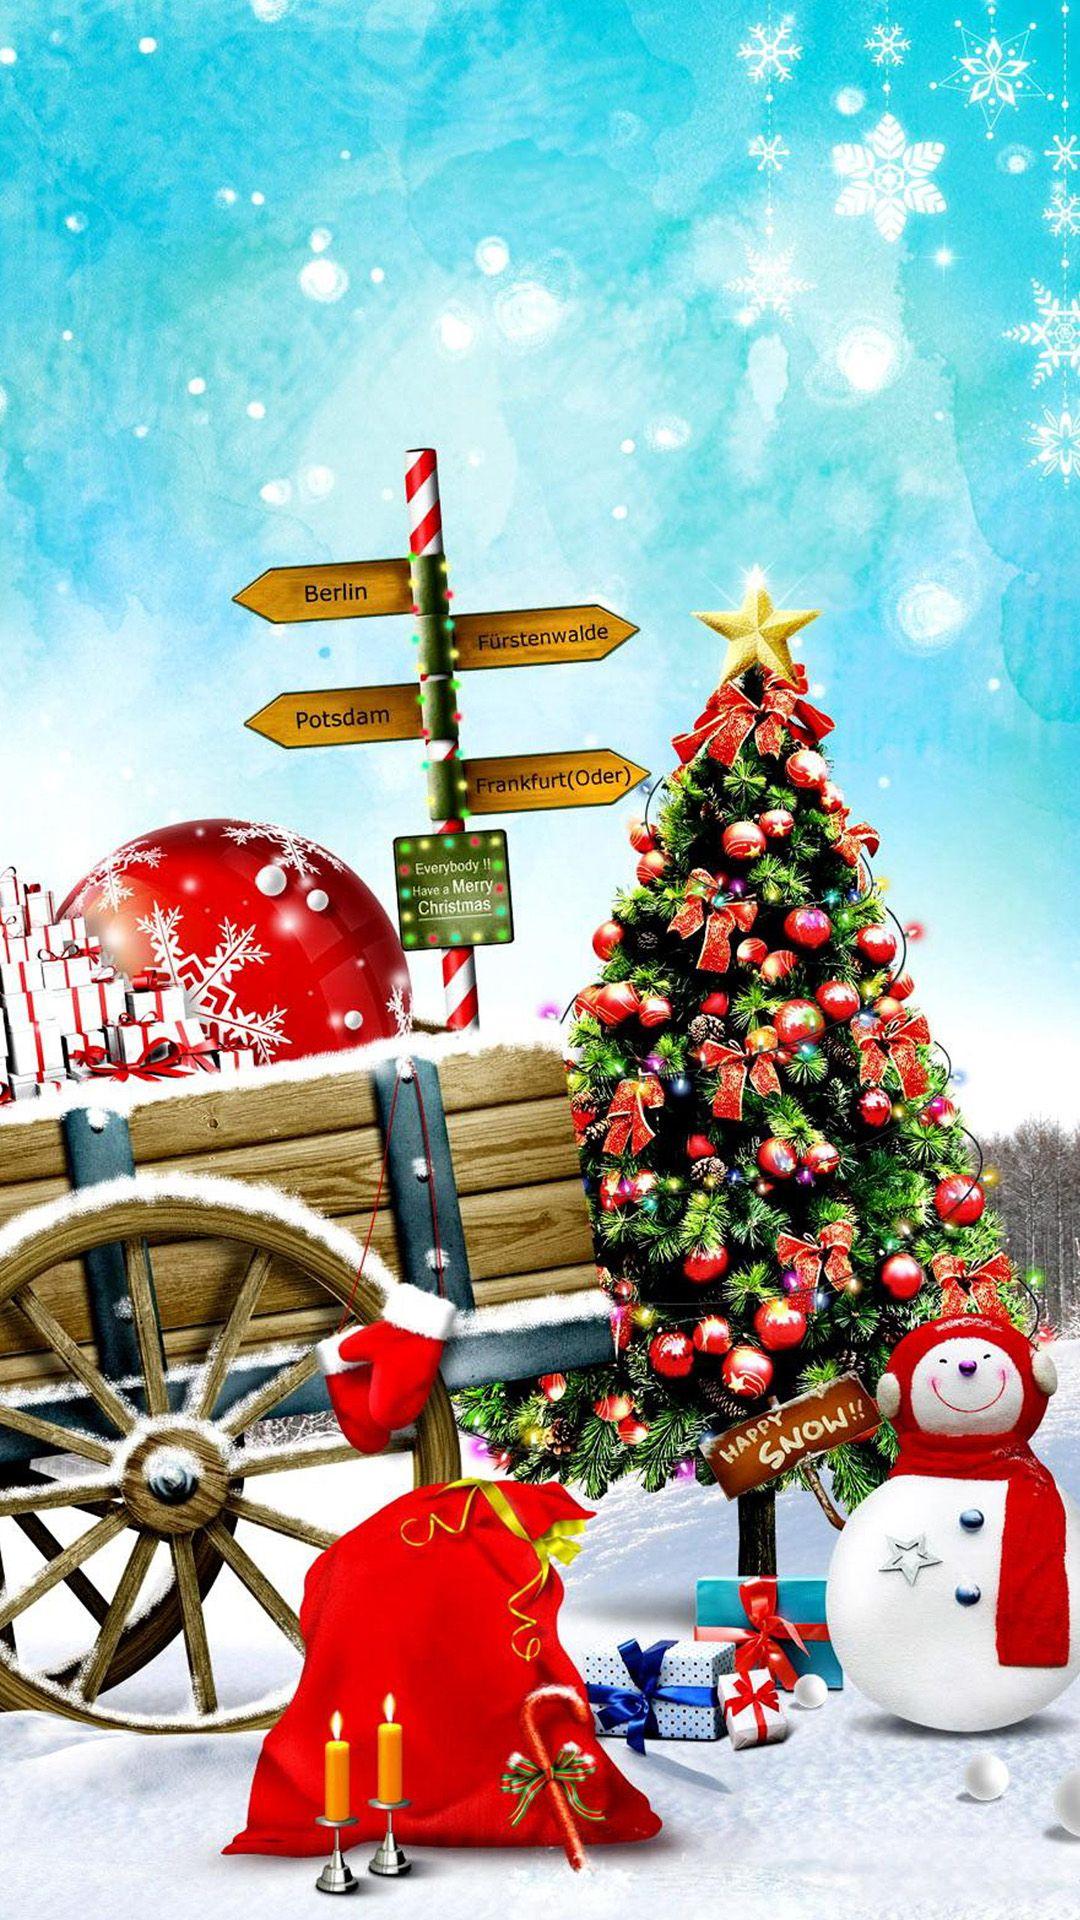 Samsung Galaxy S5 Hd Wallpapers Waoweo Com Christmas Wallpaper Christmas Wallpaper Hd Christmas Wallpaper Free